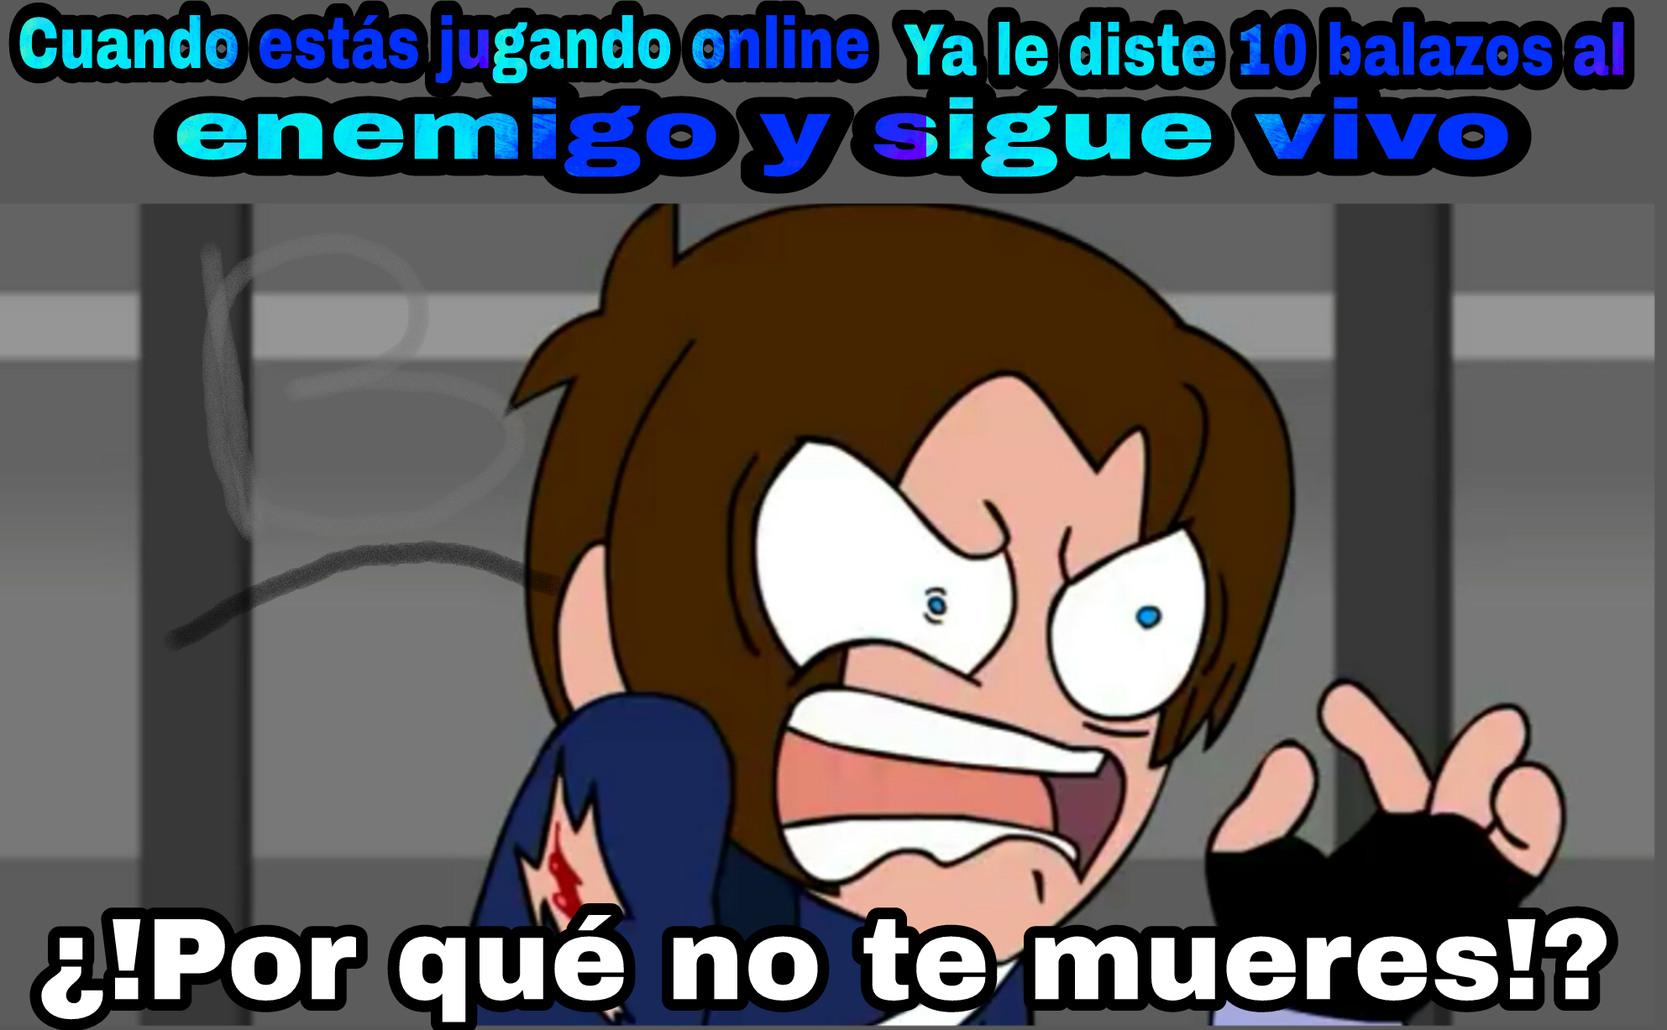 Jugar online - meme